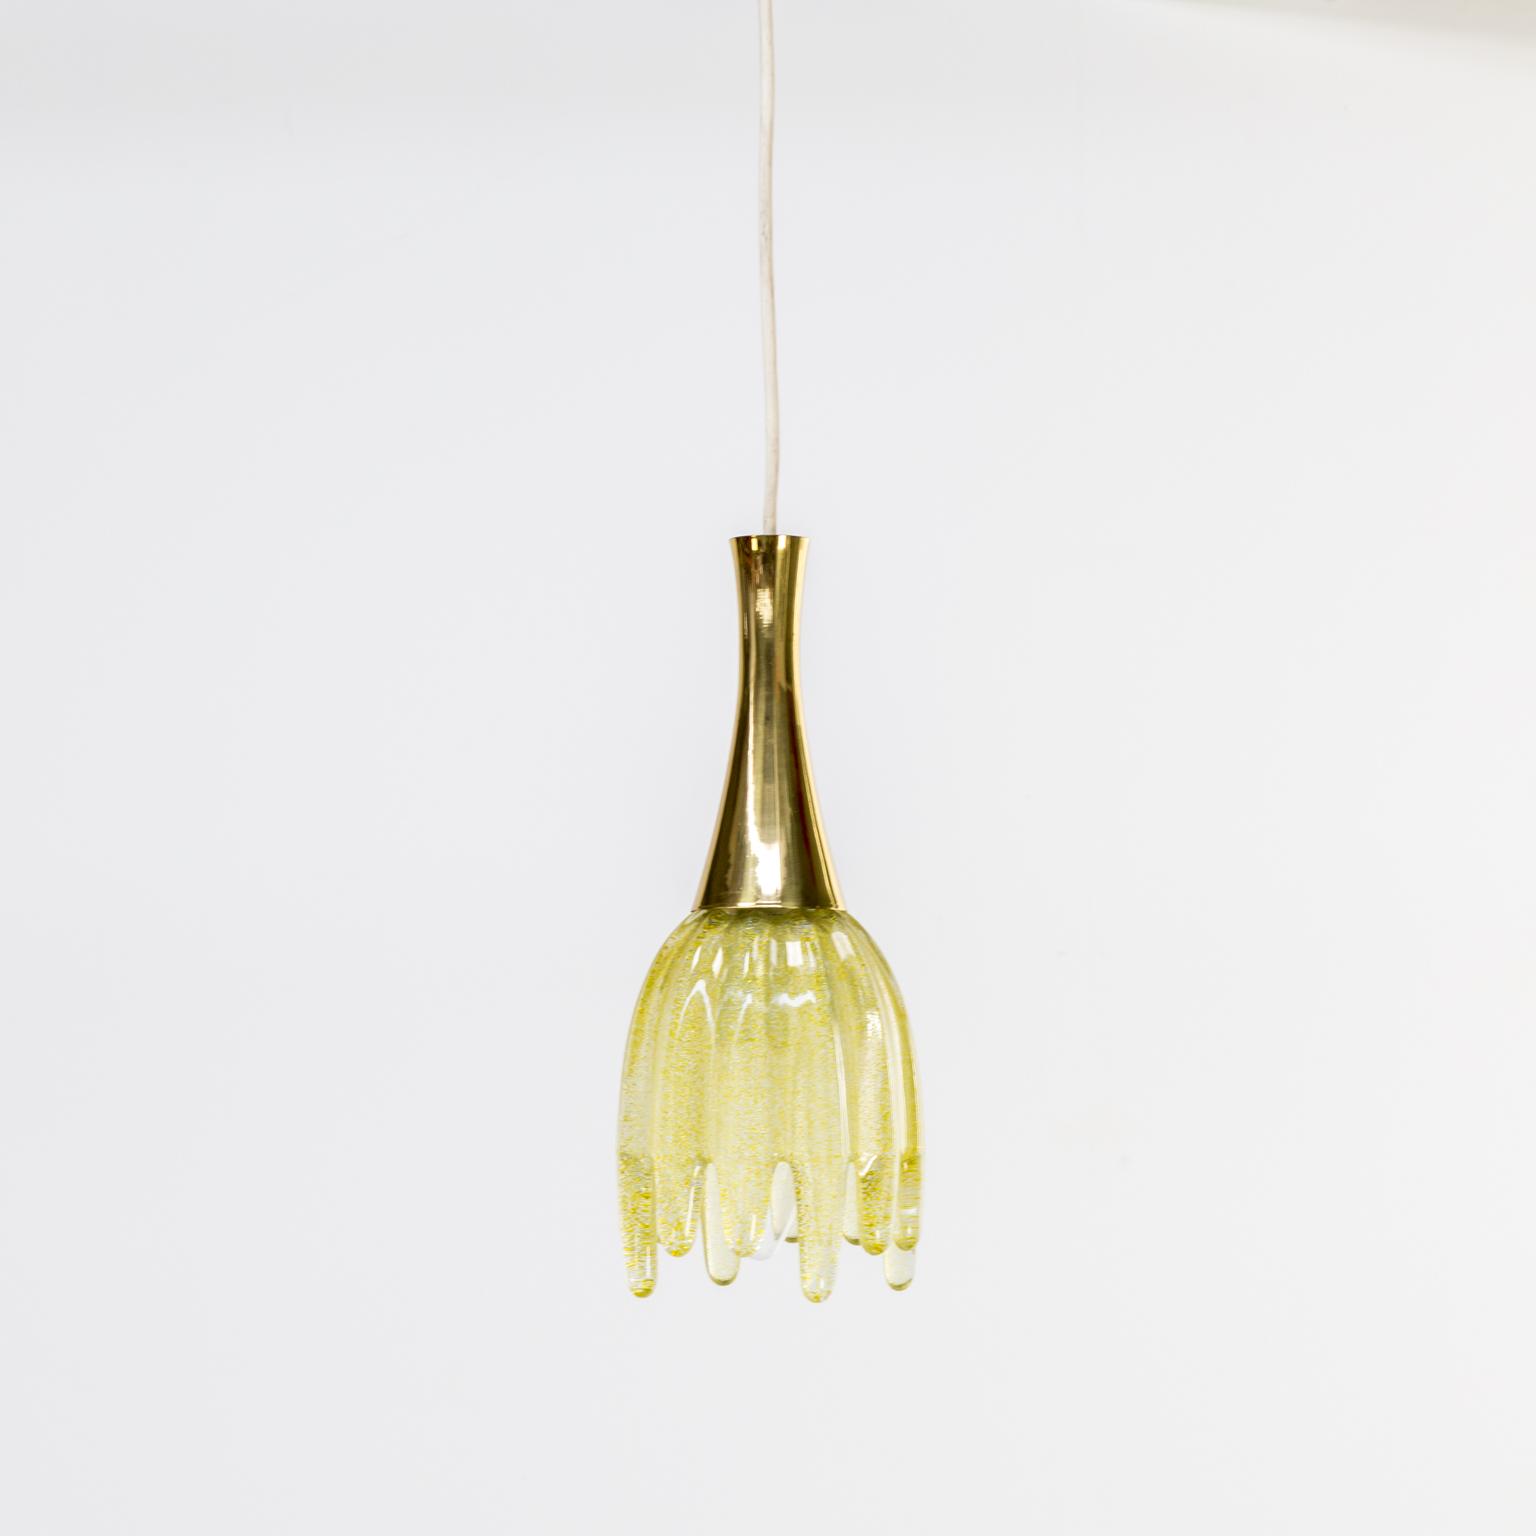 60s brass and murano glass hanging lamp